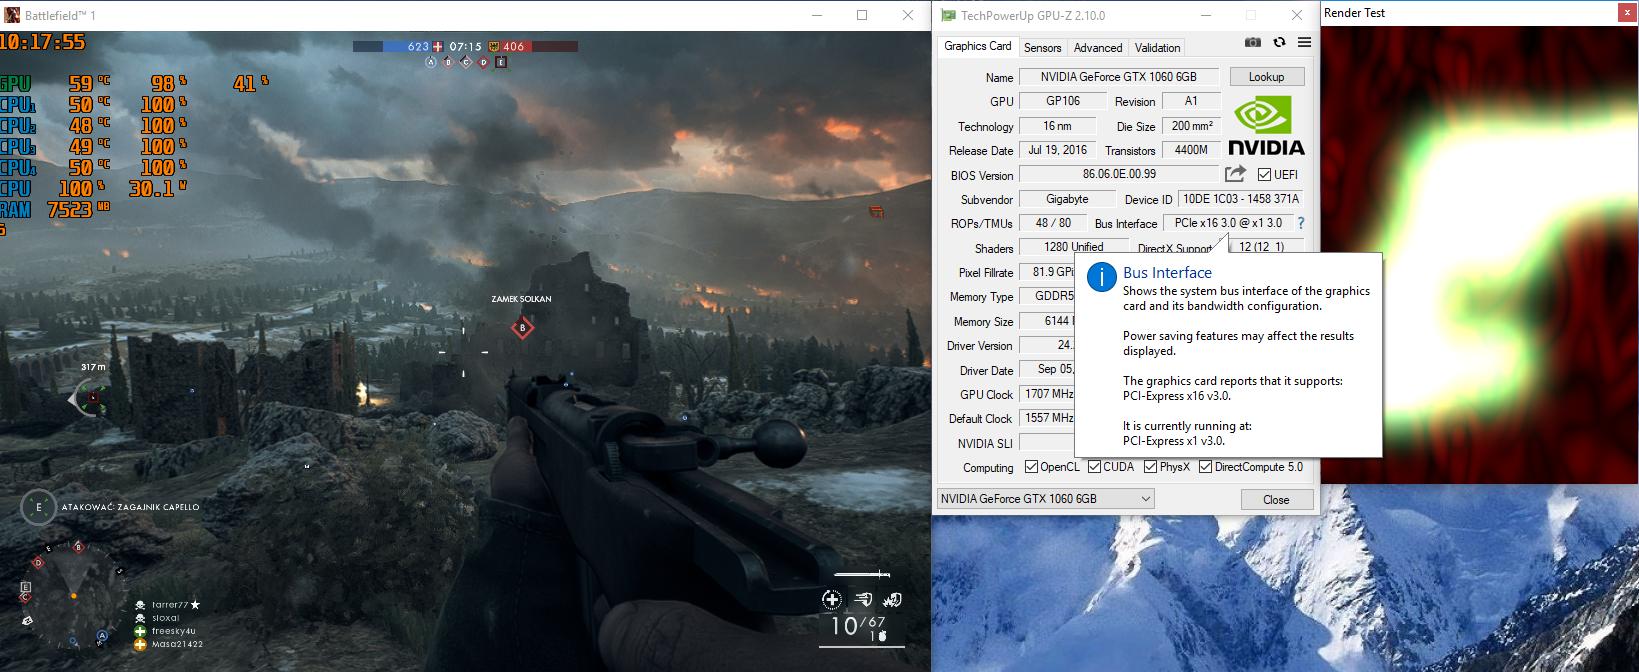 GIGABYTE GTX 1060 WindForce 2X OC running at 1x PCI E speed